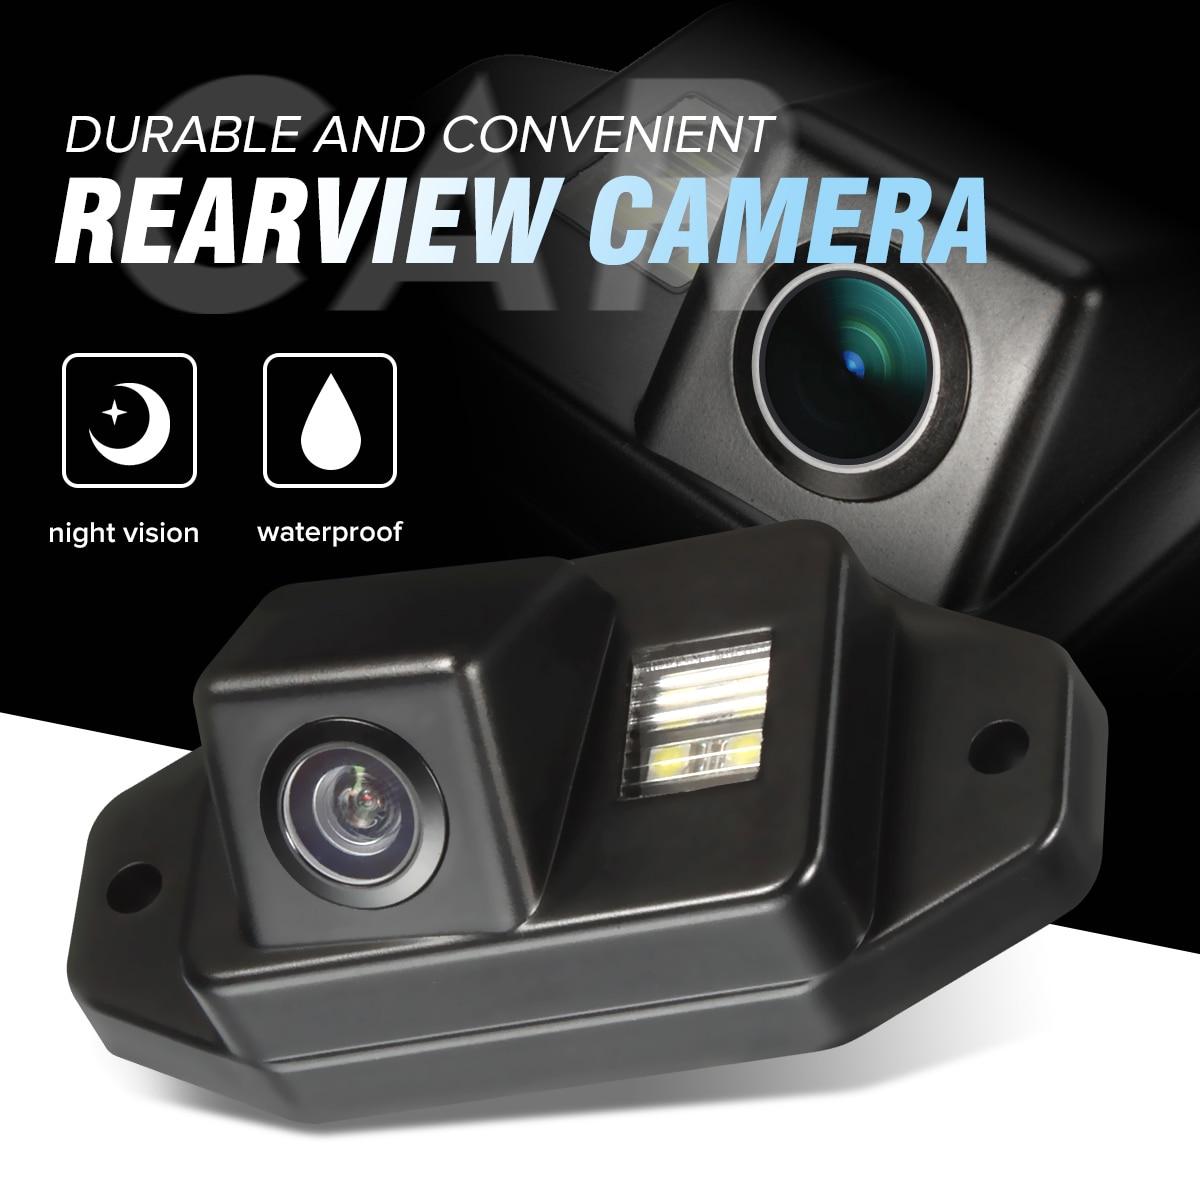 HD CCD Car Rear View Camera Back Up Reverse Parking WaterProof For Toyota Prado Land Cruiser 120 2002 2009 Prado 2700 4000|Vehicle Camera| |  - title=